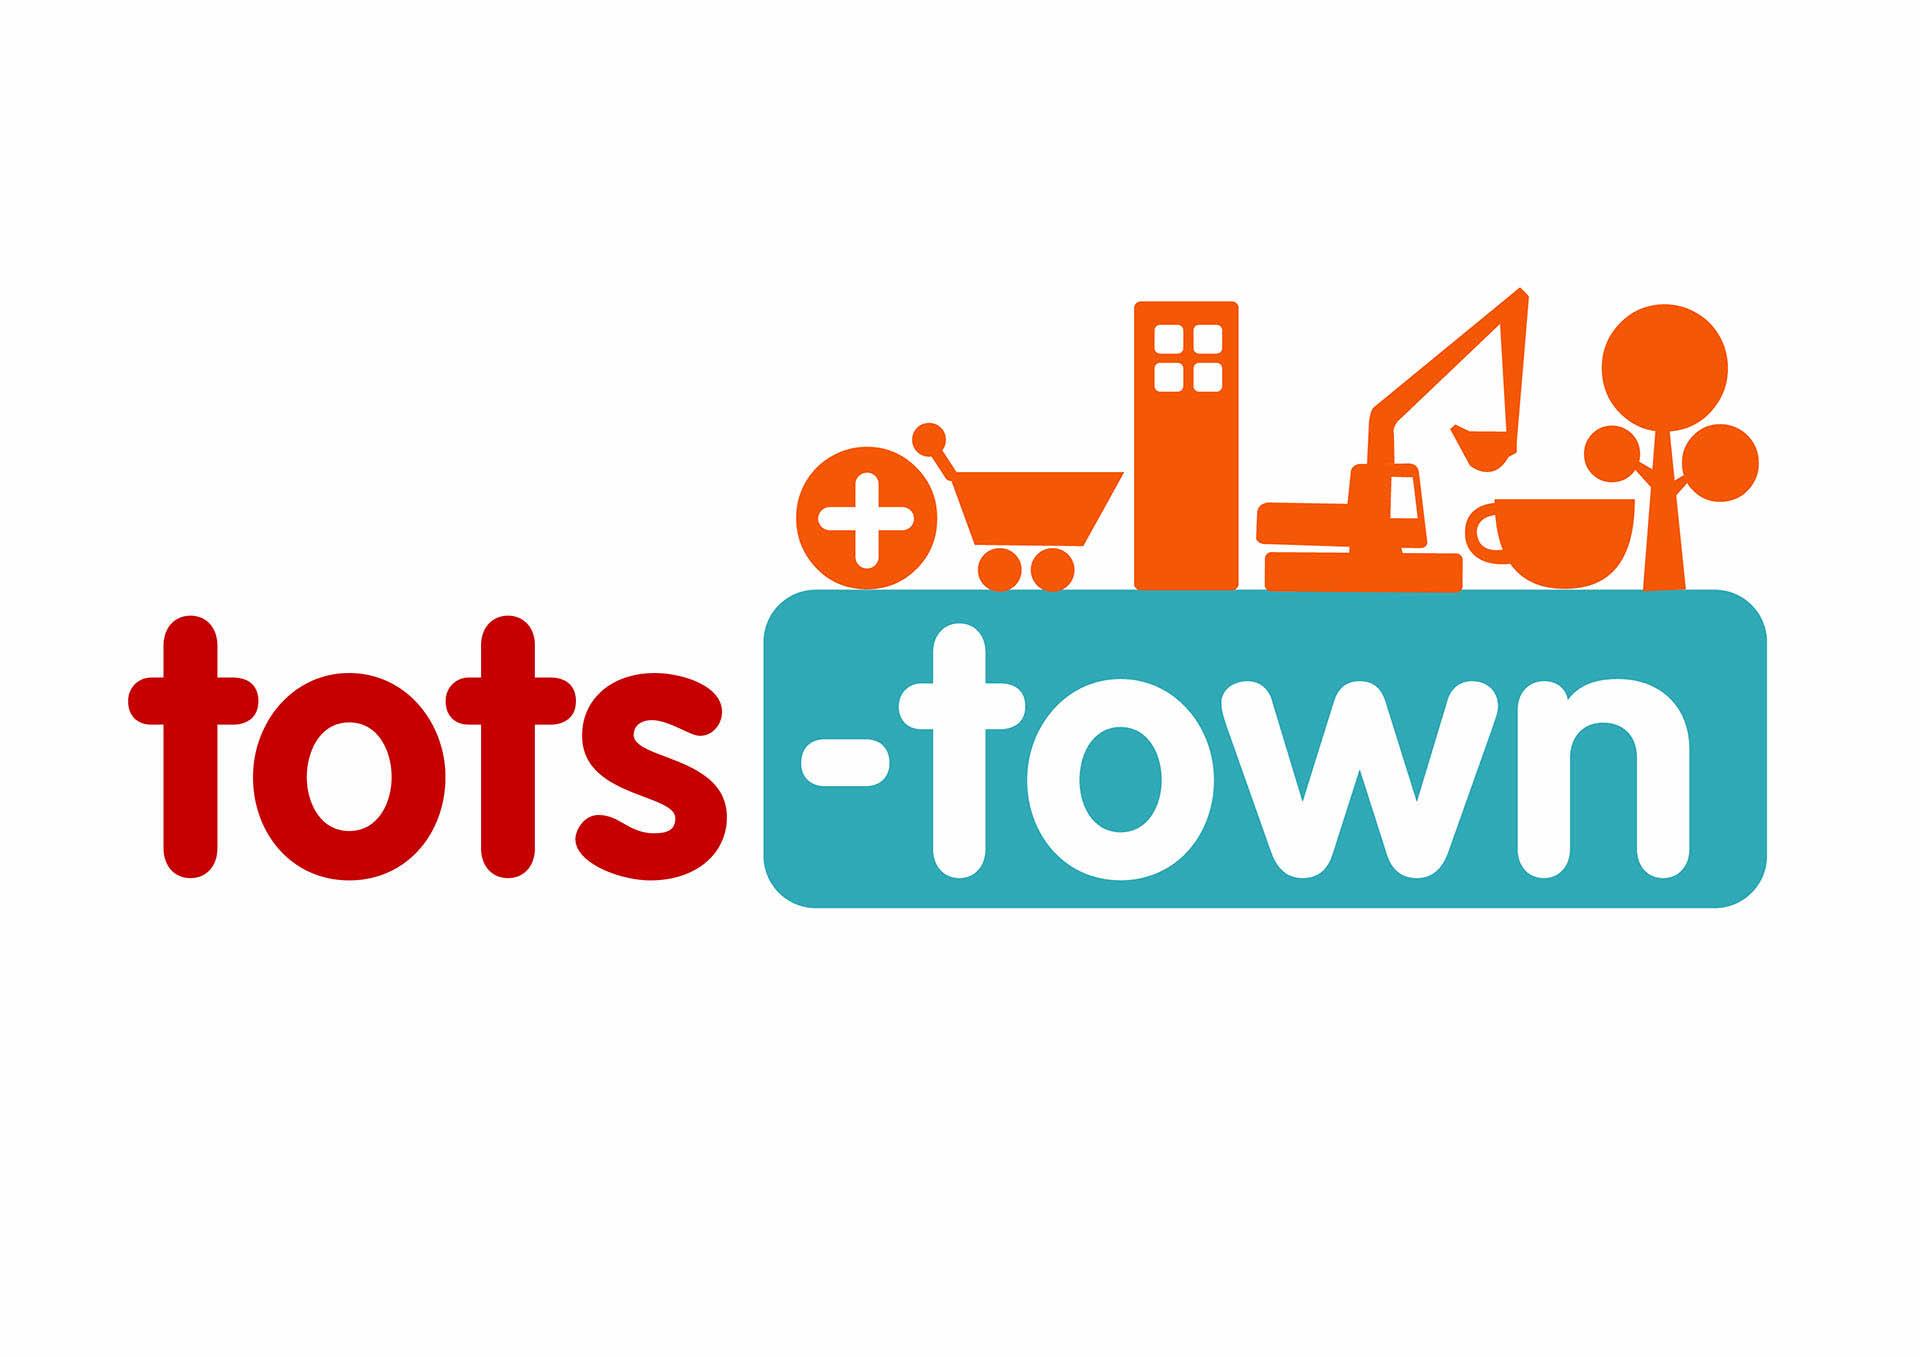 Tots Town's logo